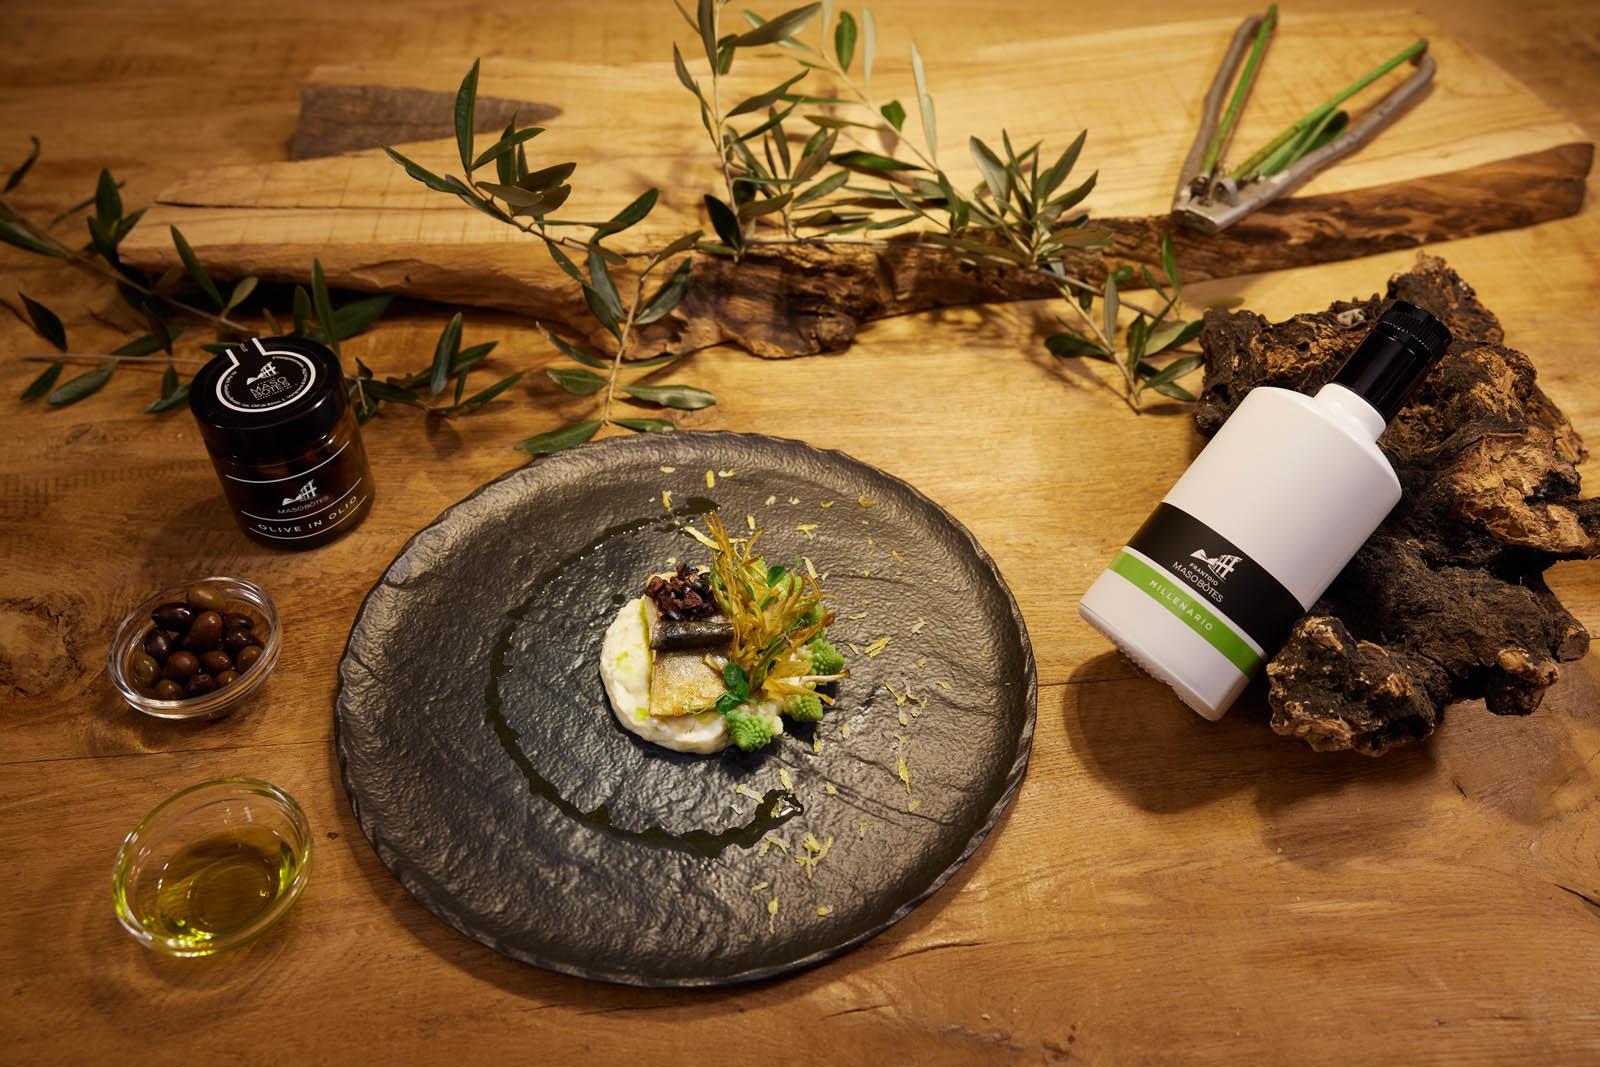 Maso Botes Millenario - Olio Extravergine di oliva Biologico Monocultivar Casaliva